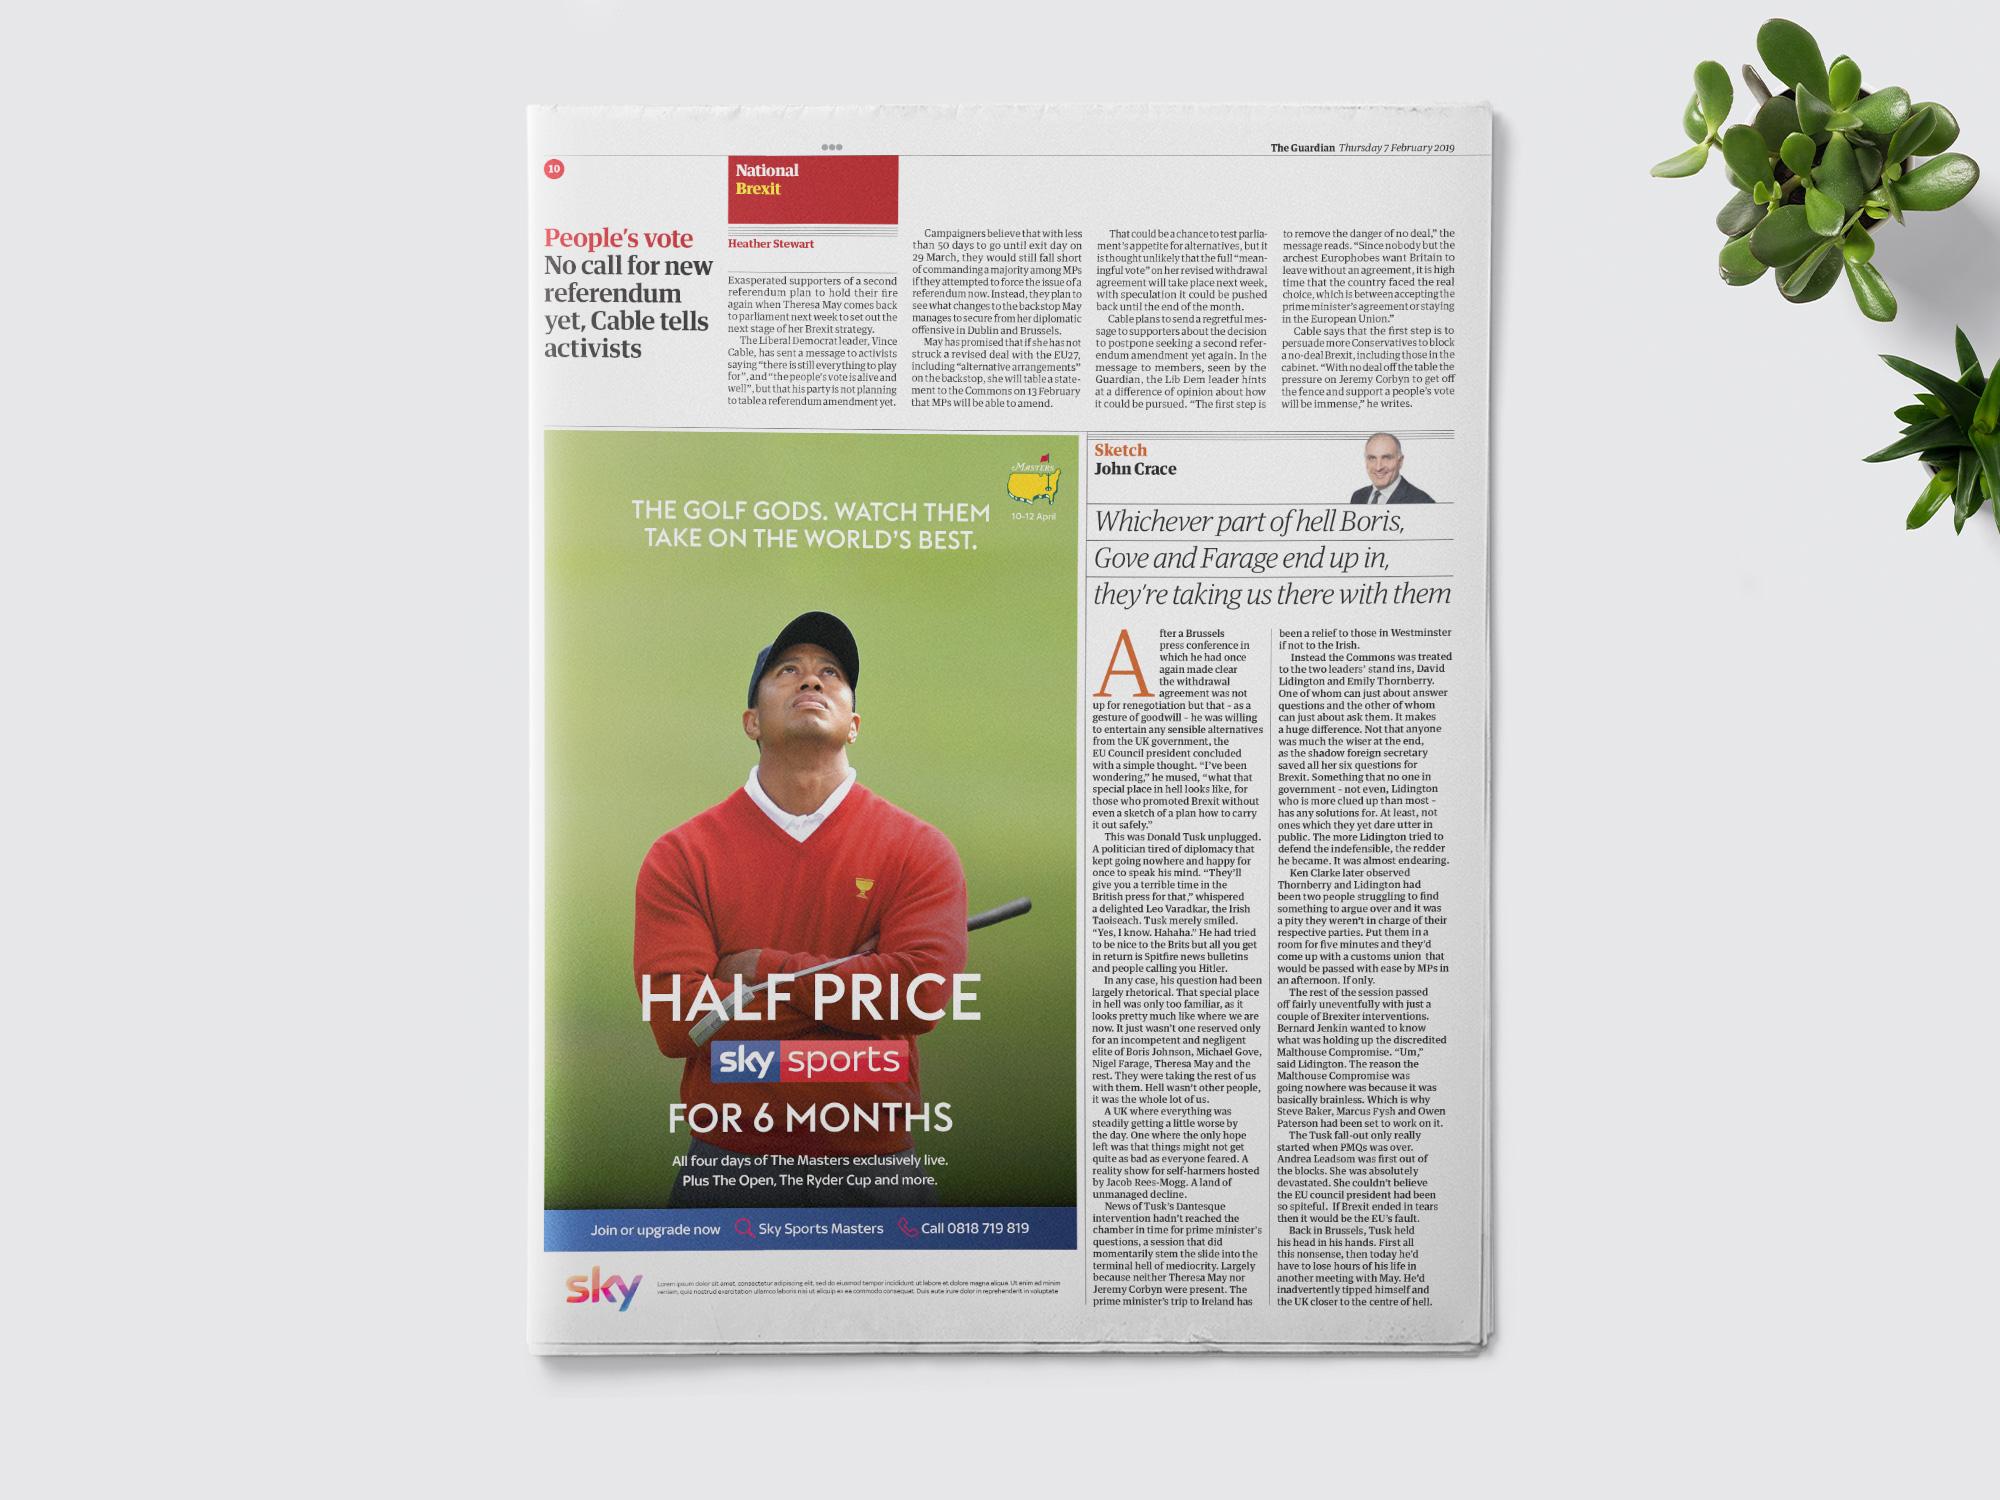 Golf_Gods-Newspaper